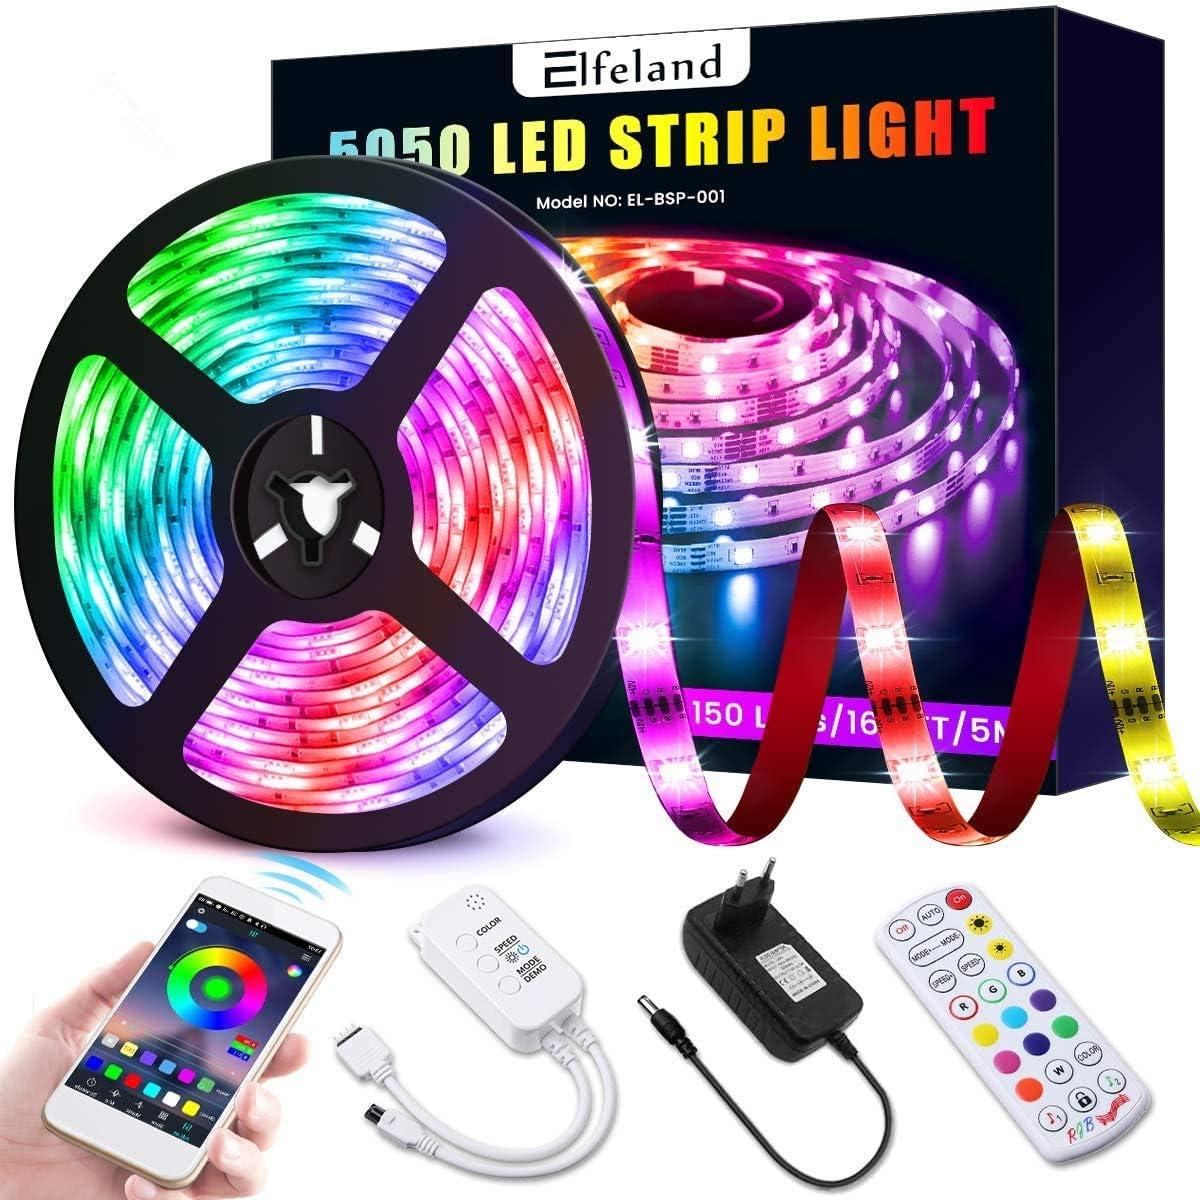 Elfeland LED Strip 5 m RGB 5050SMD 150 LED Strips